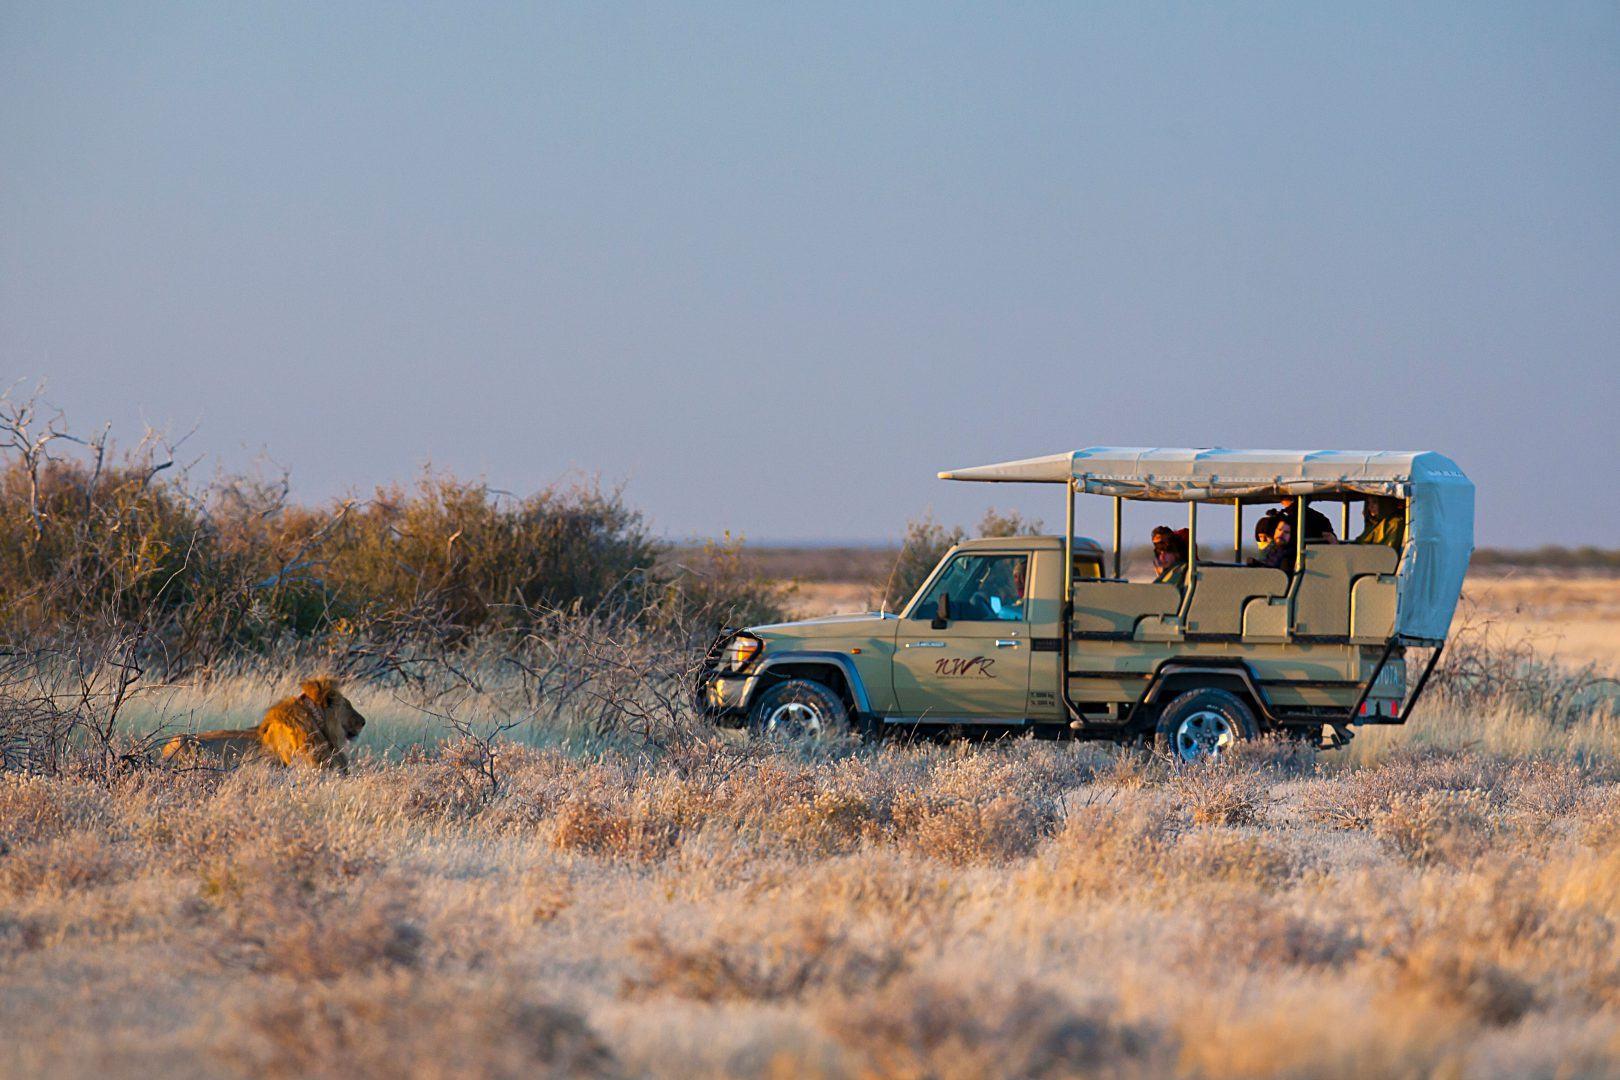 Namibia & Botswana Self Drive - Camping | Selfdrive4x4 com